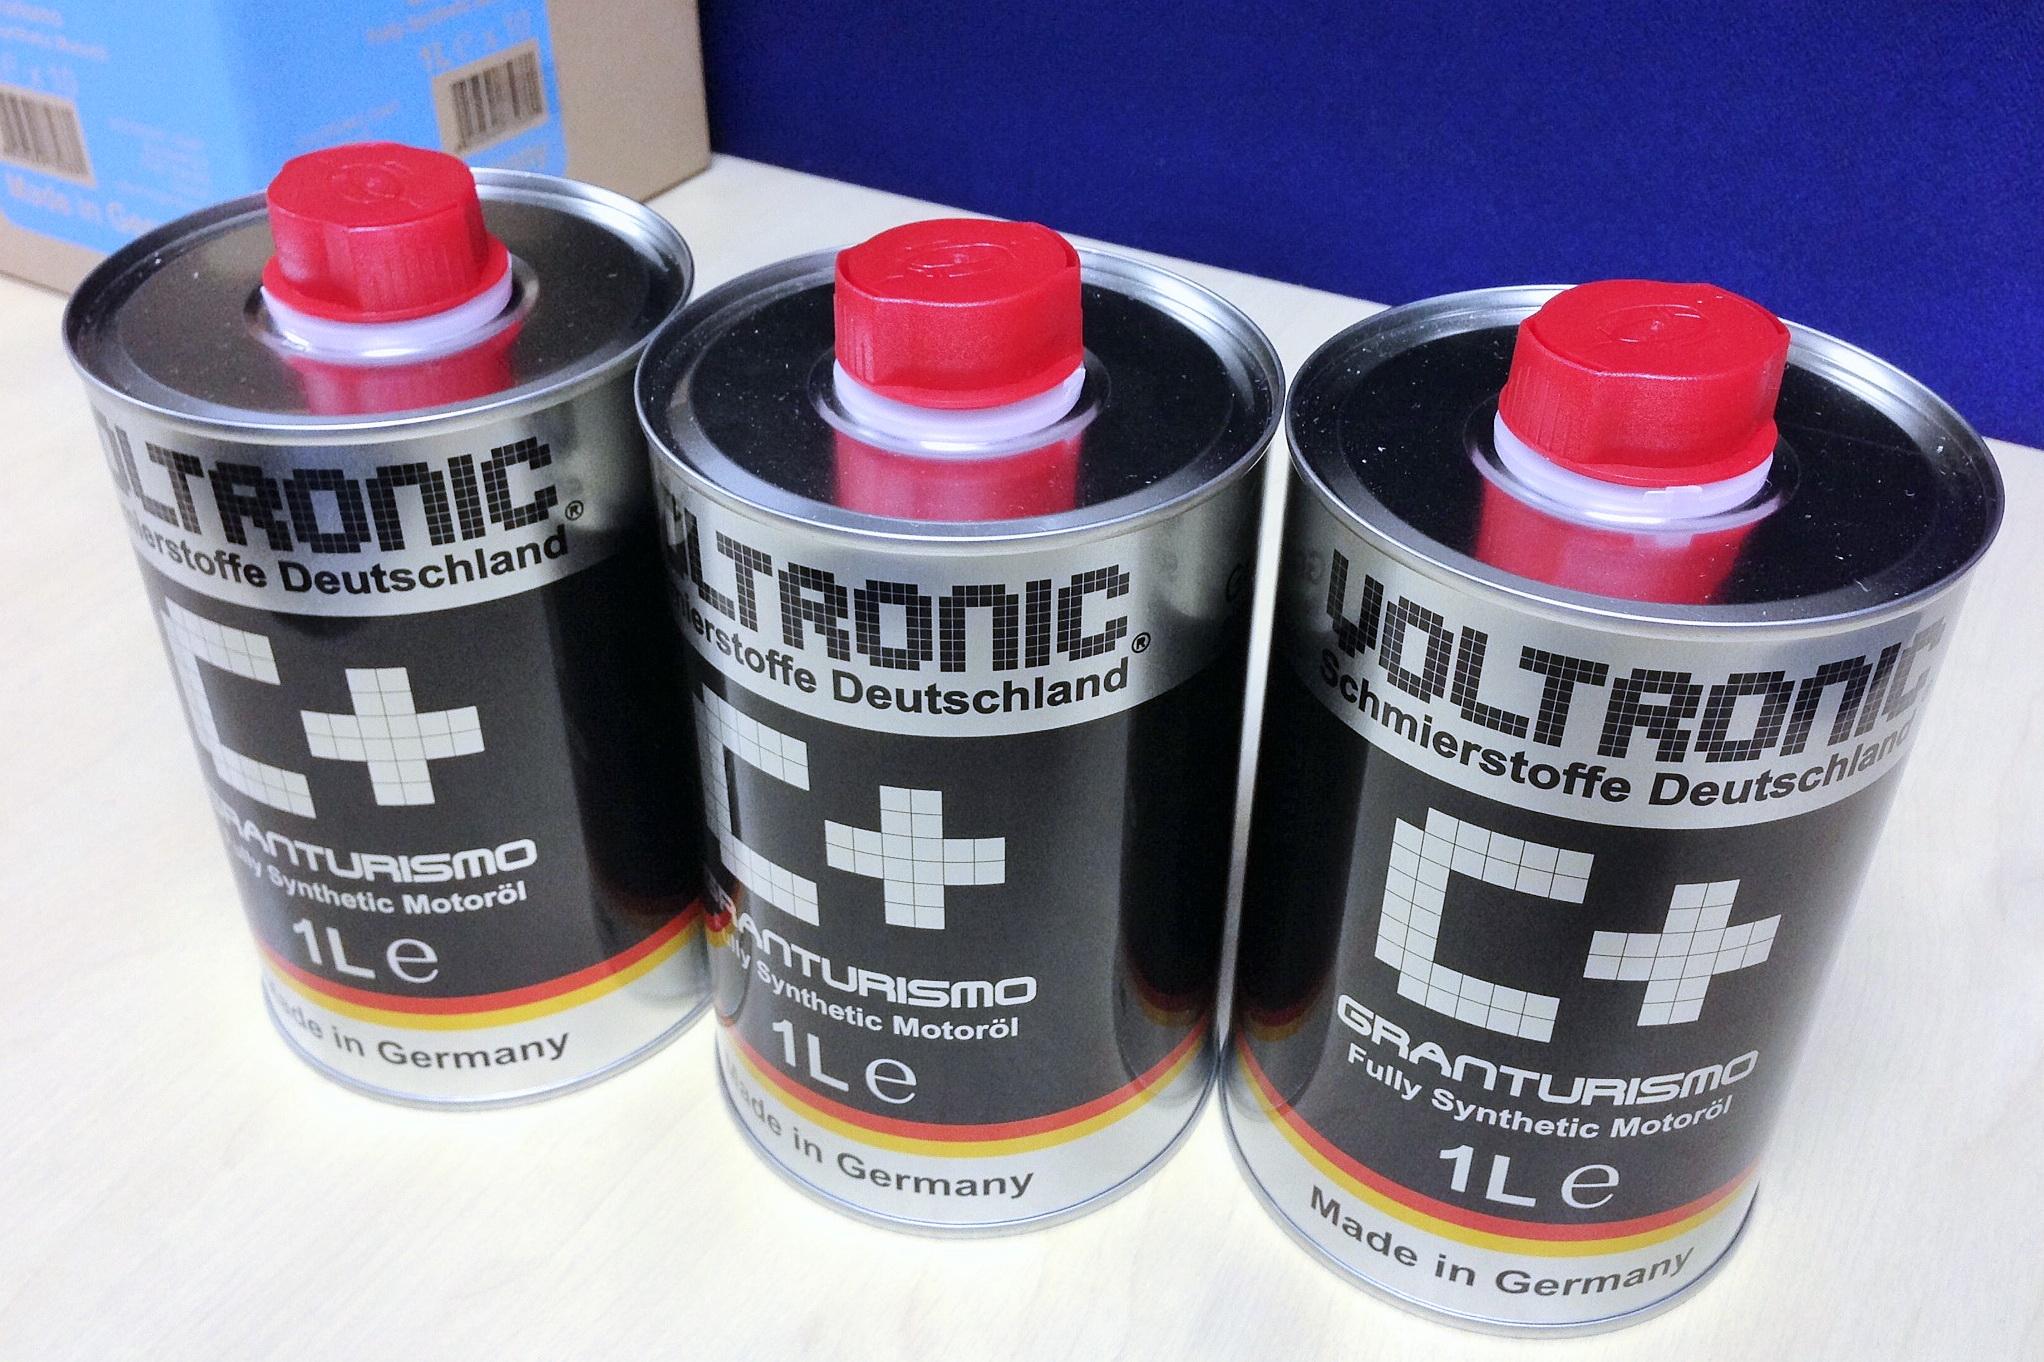 voltronic-c-voltronic-engine-oil-1